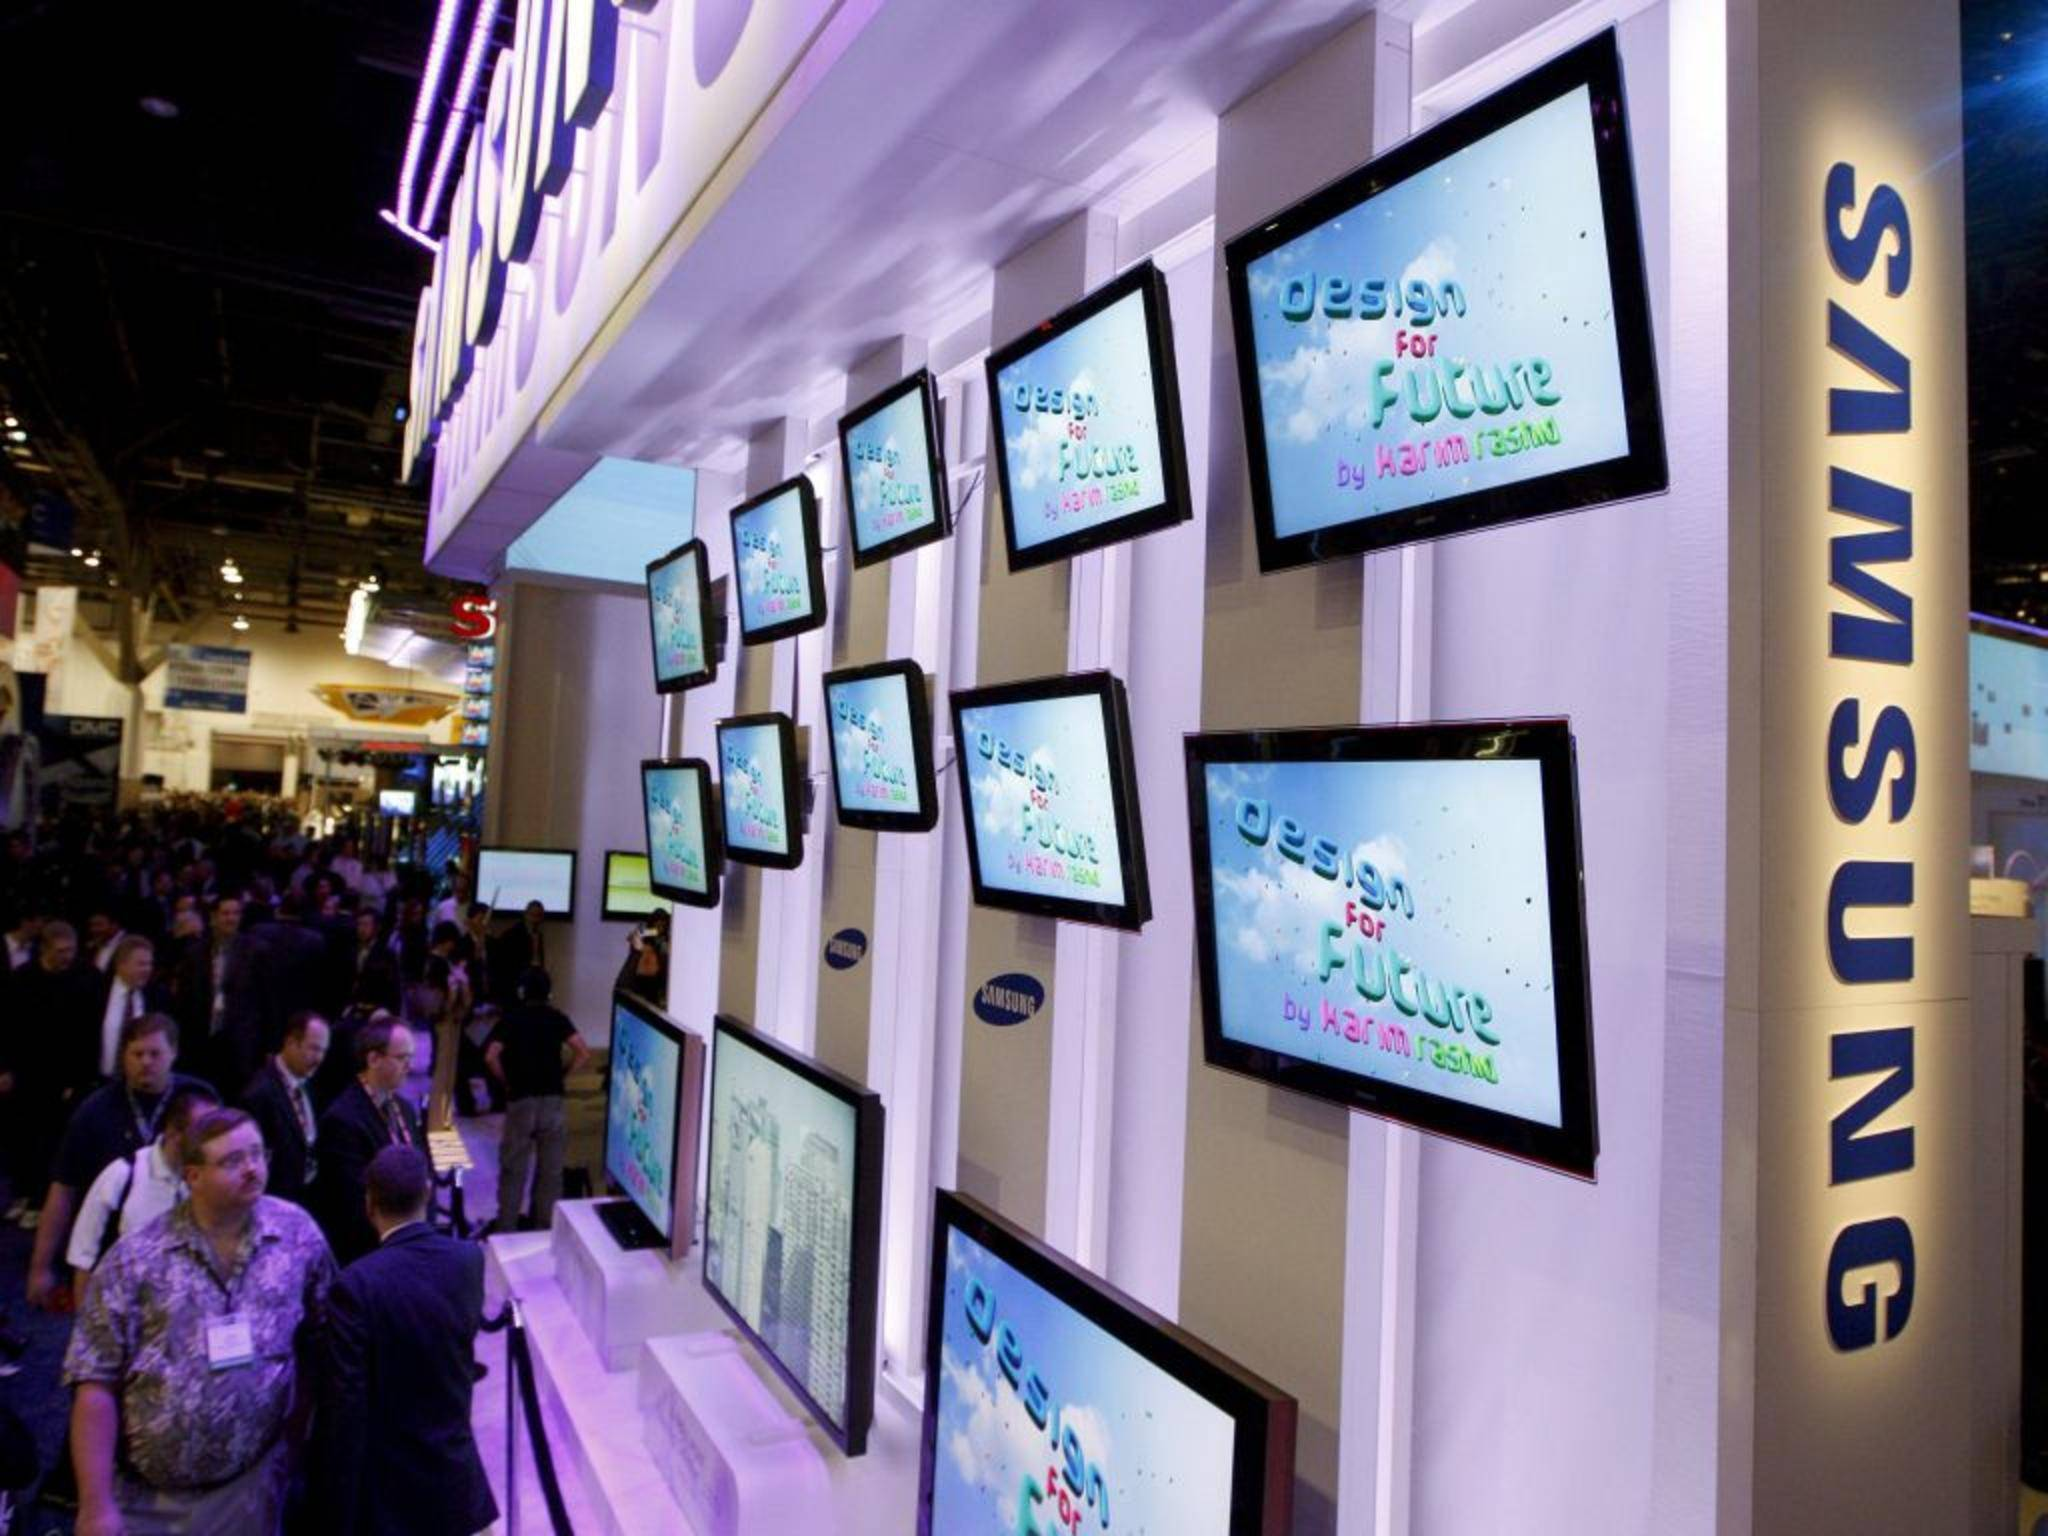 Samsung Smart Tv Betriebssystem